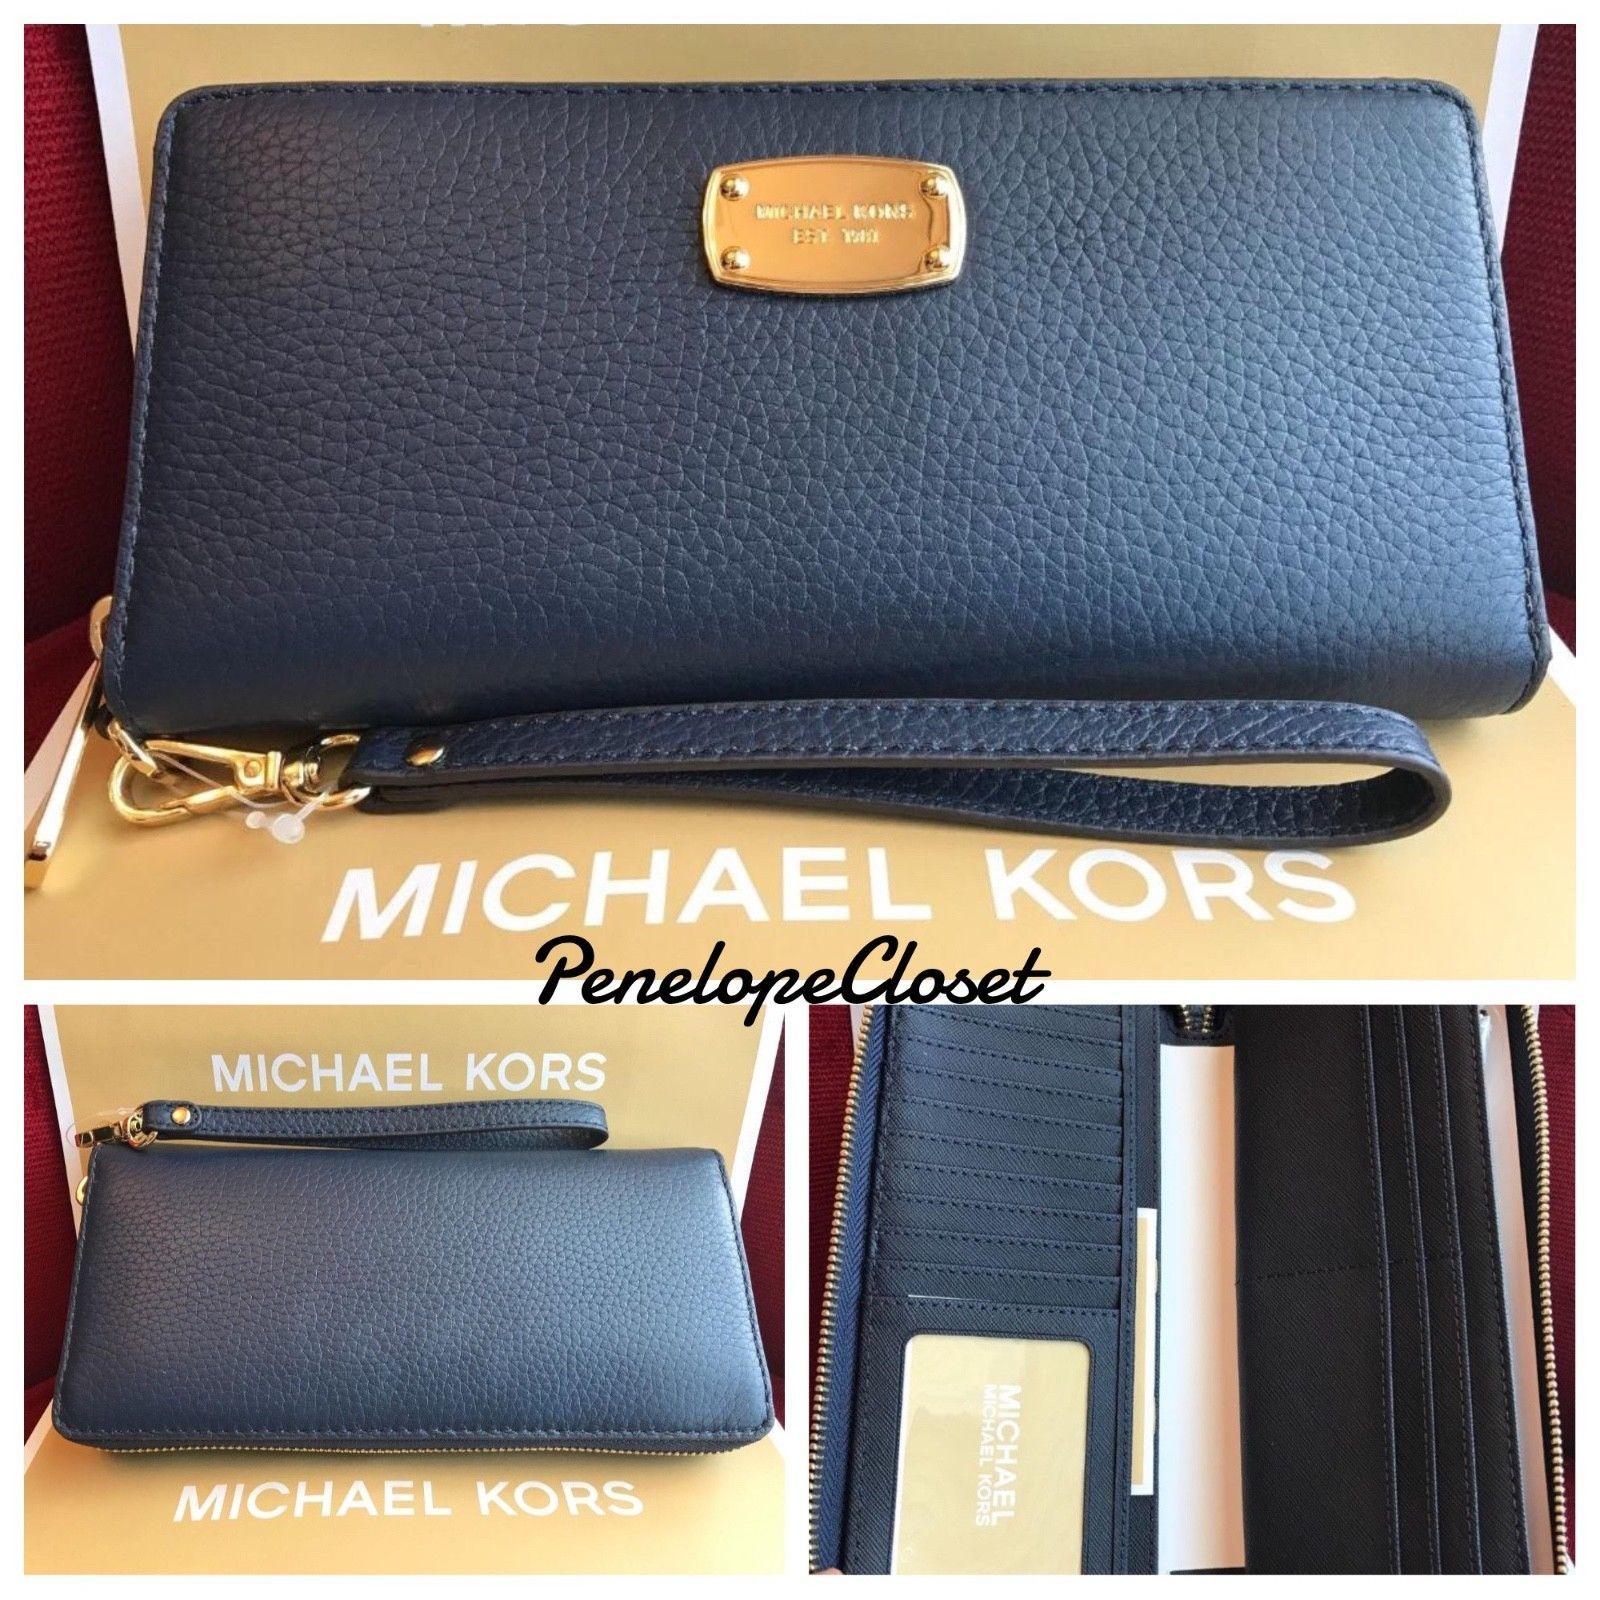 8dc30c328572 Nwt Michael Kors Leather Jet Set Travel and 50 similar items. 57